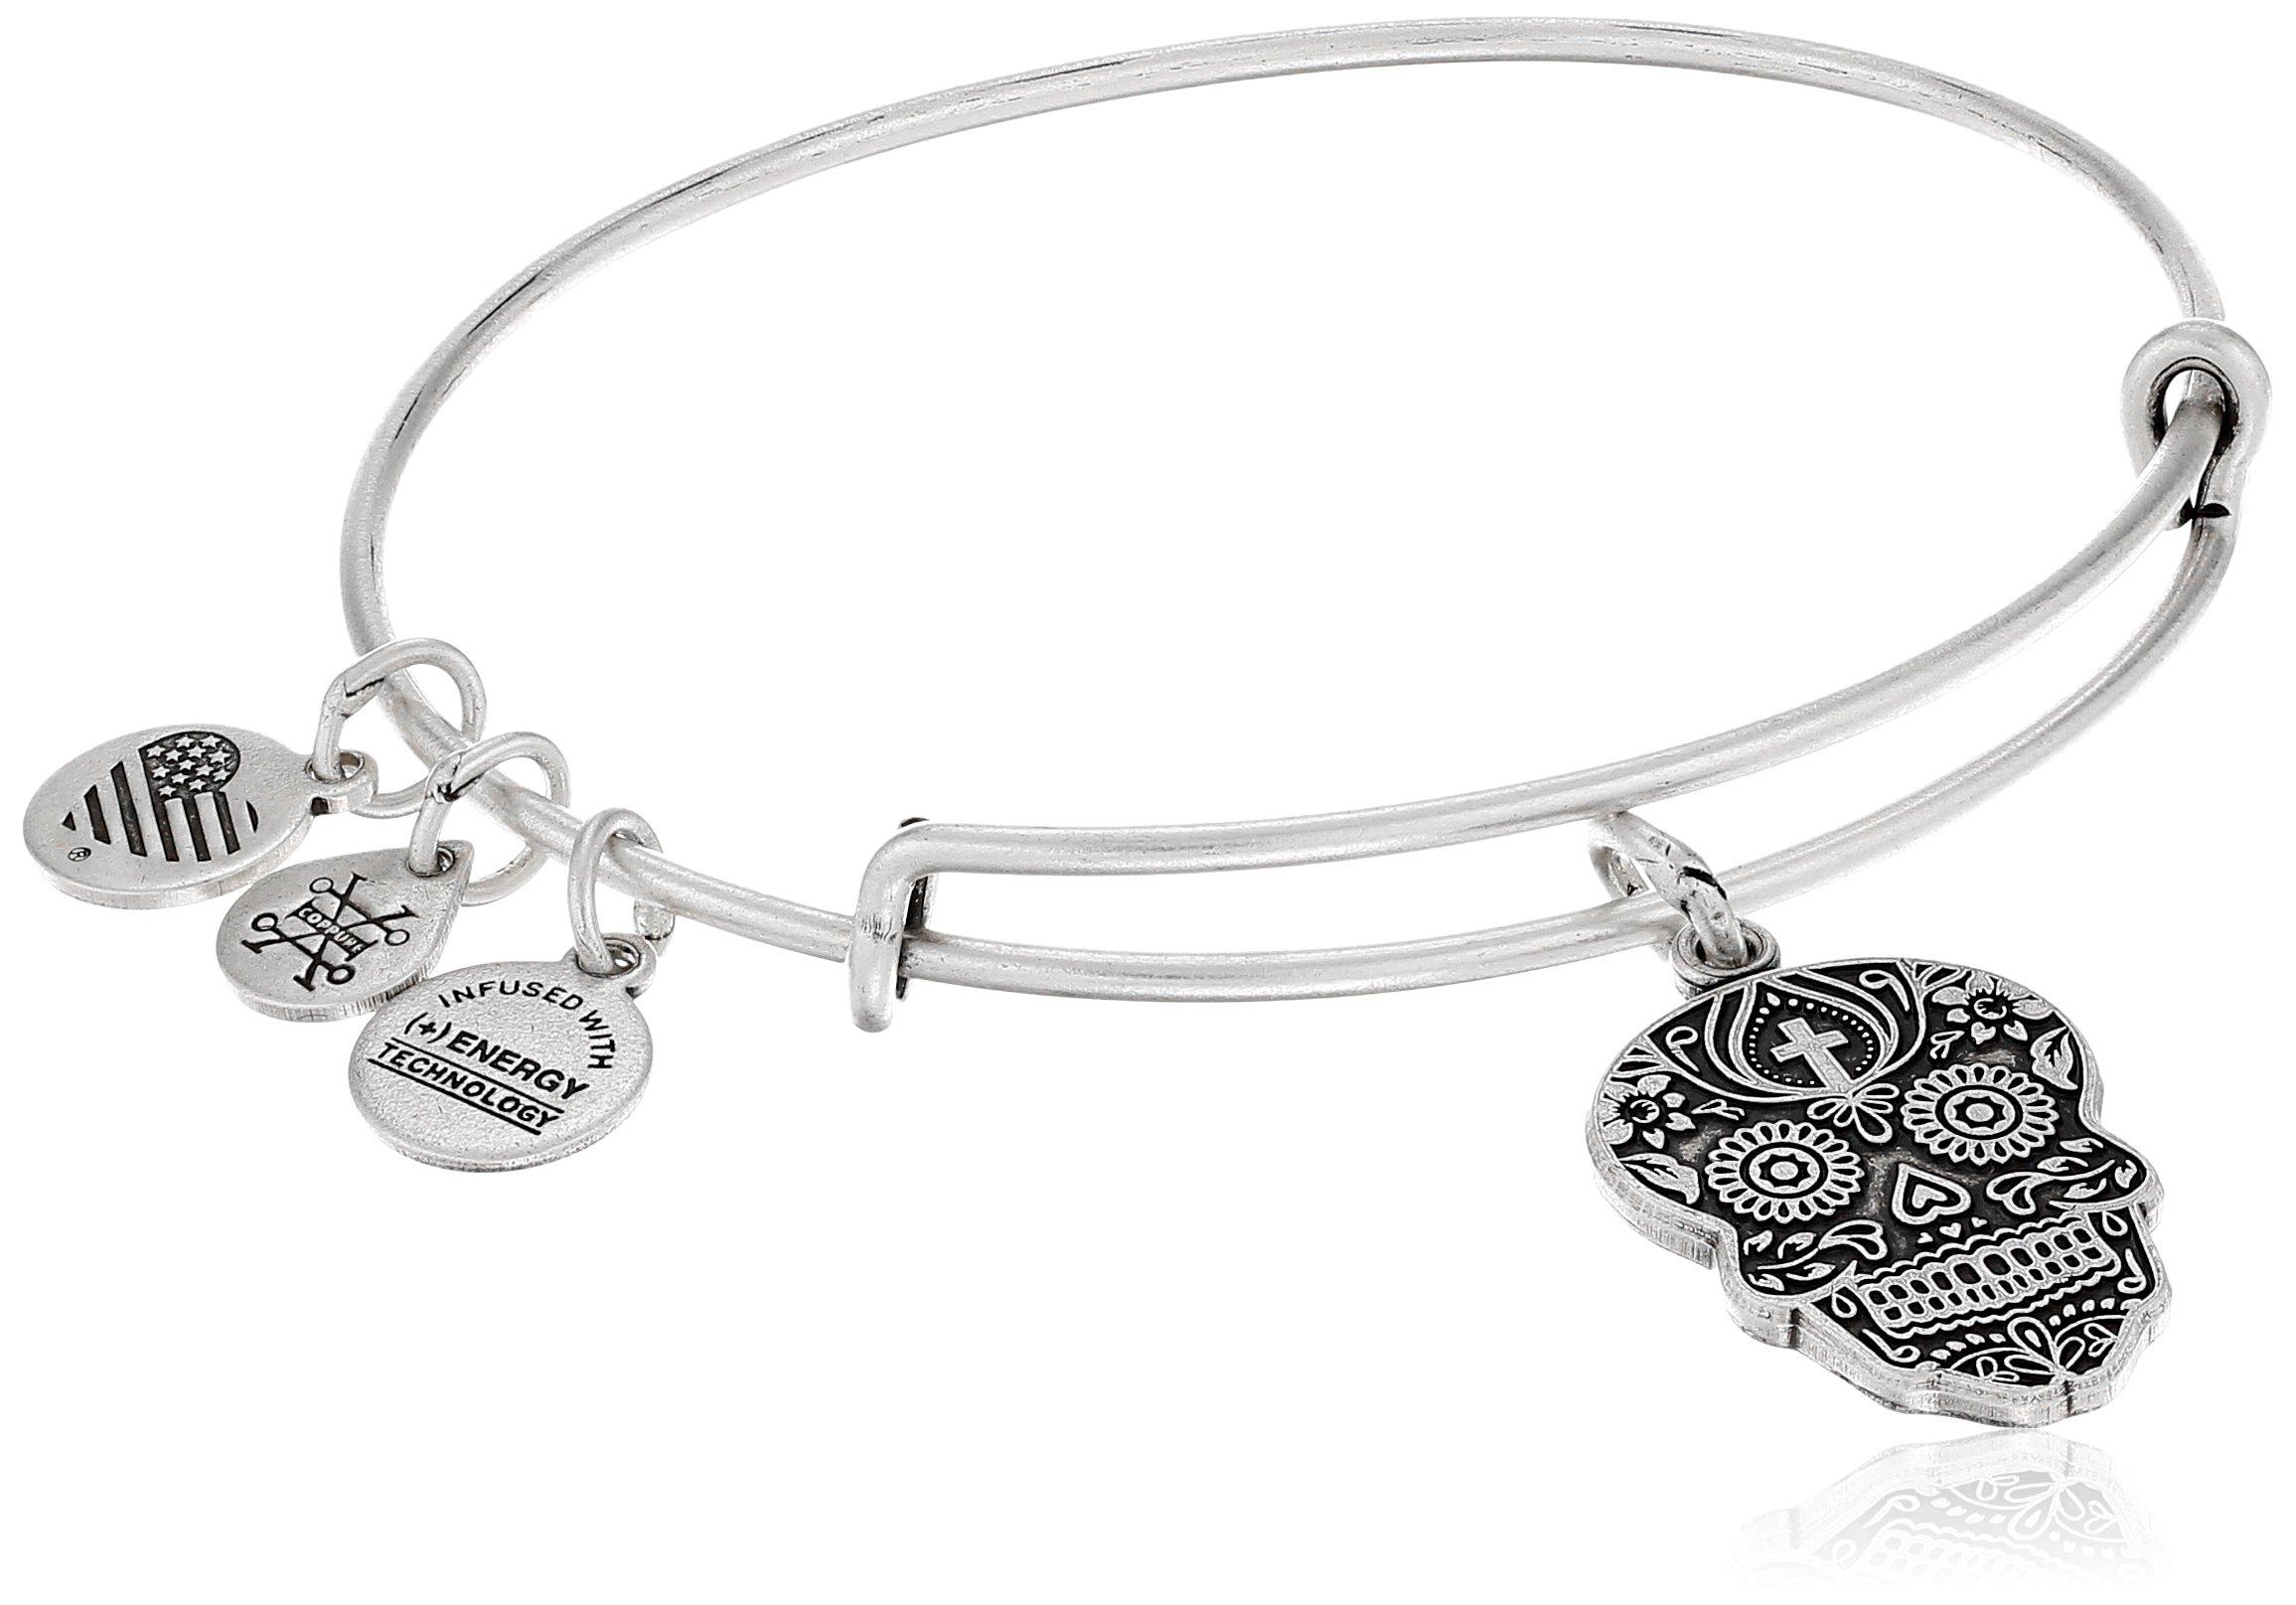 Alex and Ani Calavera Rafaelian Silver Bangle Bracelet